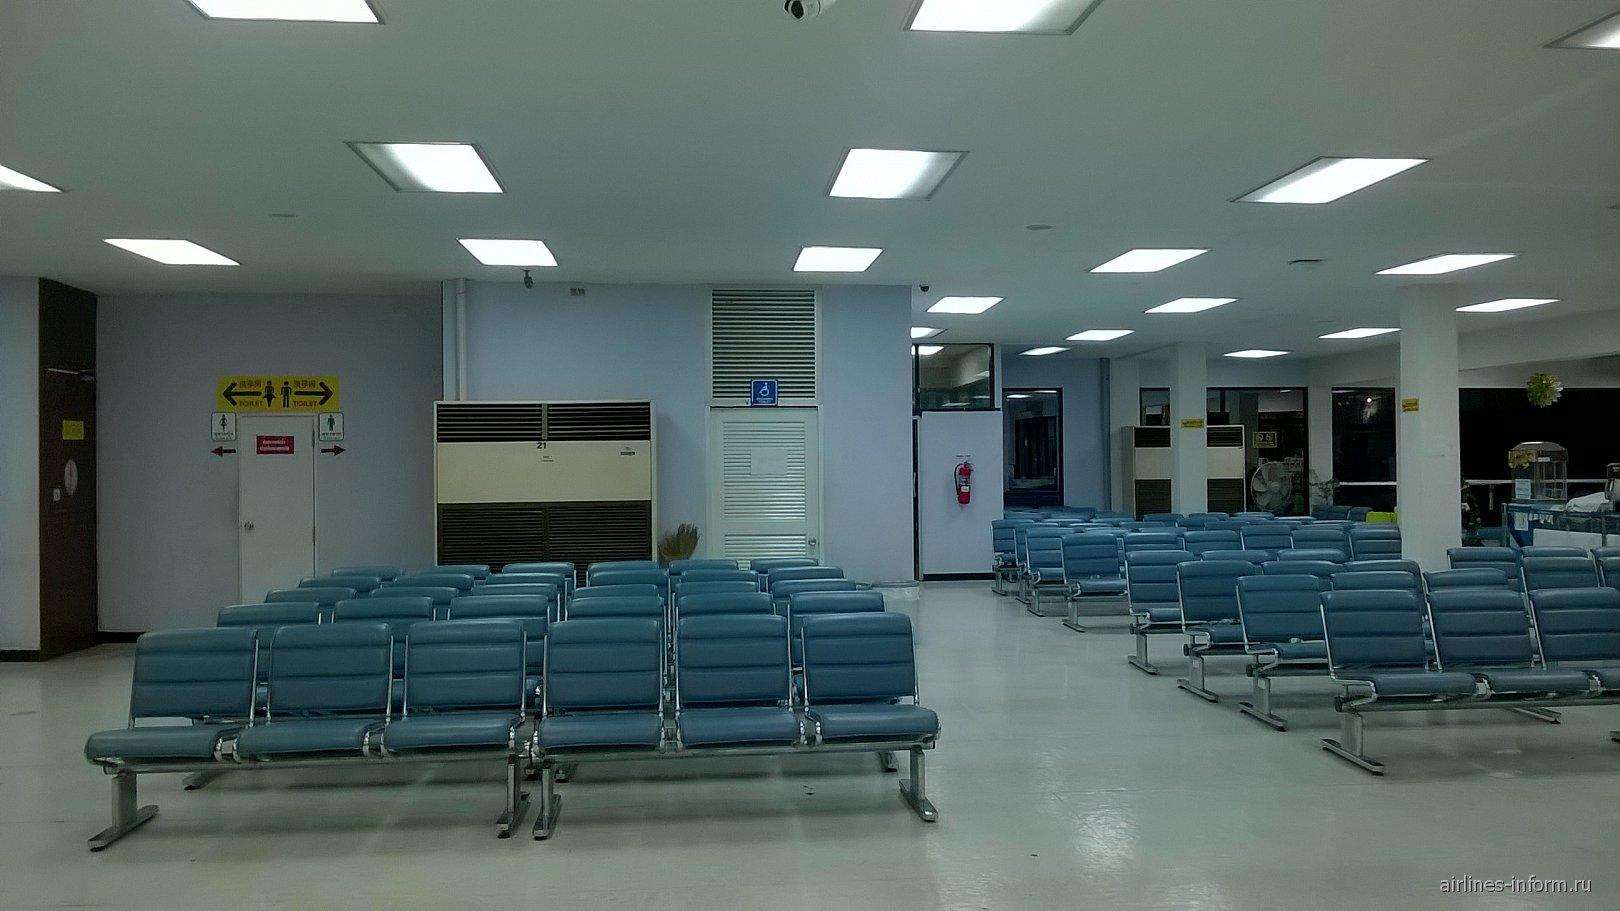 Зал ожидания в аэропорту Утапао